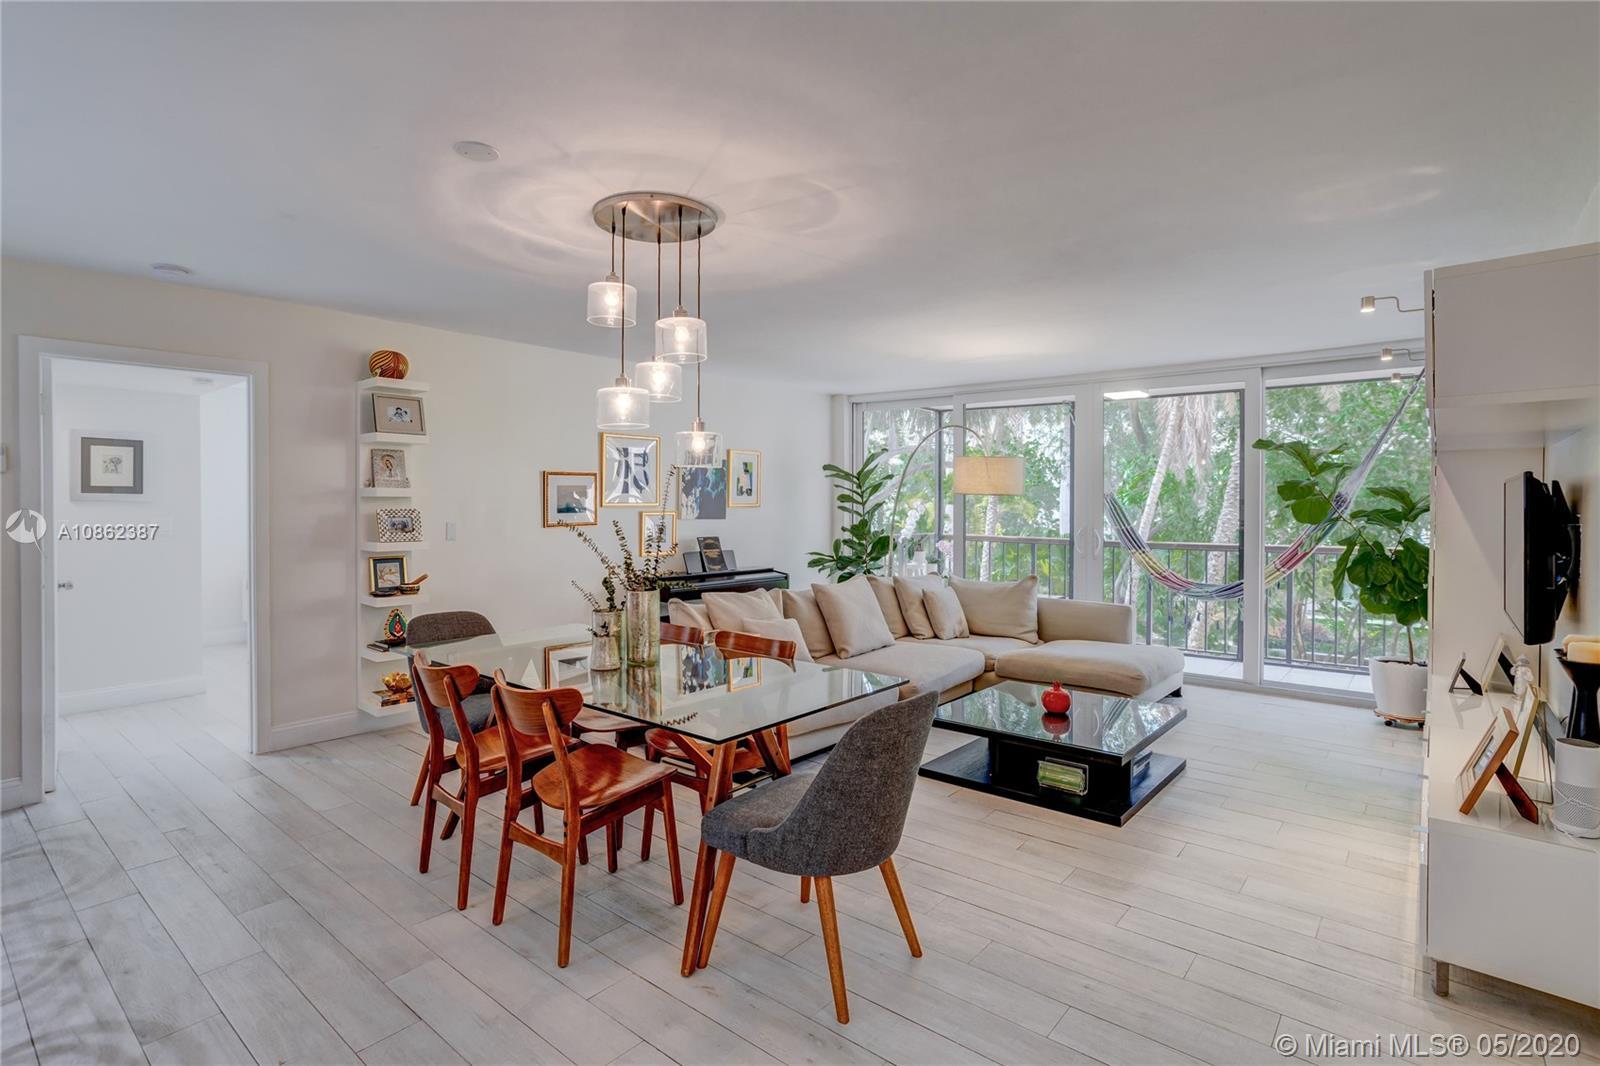 55 Ocean Lane Dr # 2033, Key Biscayne, Florida 33149, 3 Bedrooms Bedrooms, ,2 BathroomsBathrooms,Residential,For Sale,55 Ocean Lane Dr # 2033,A10862387